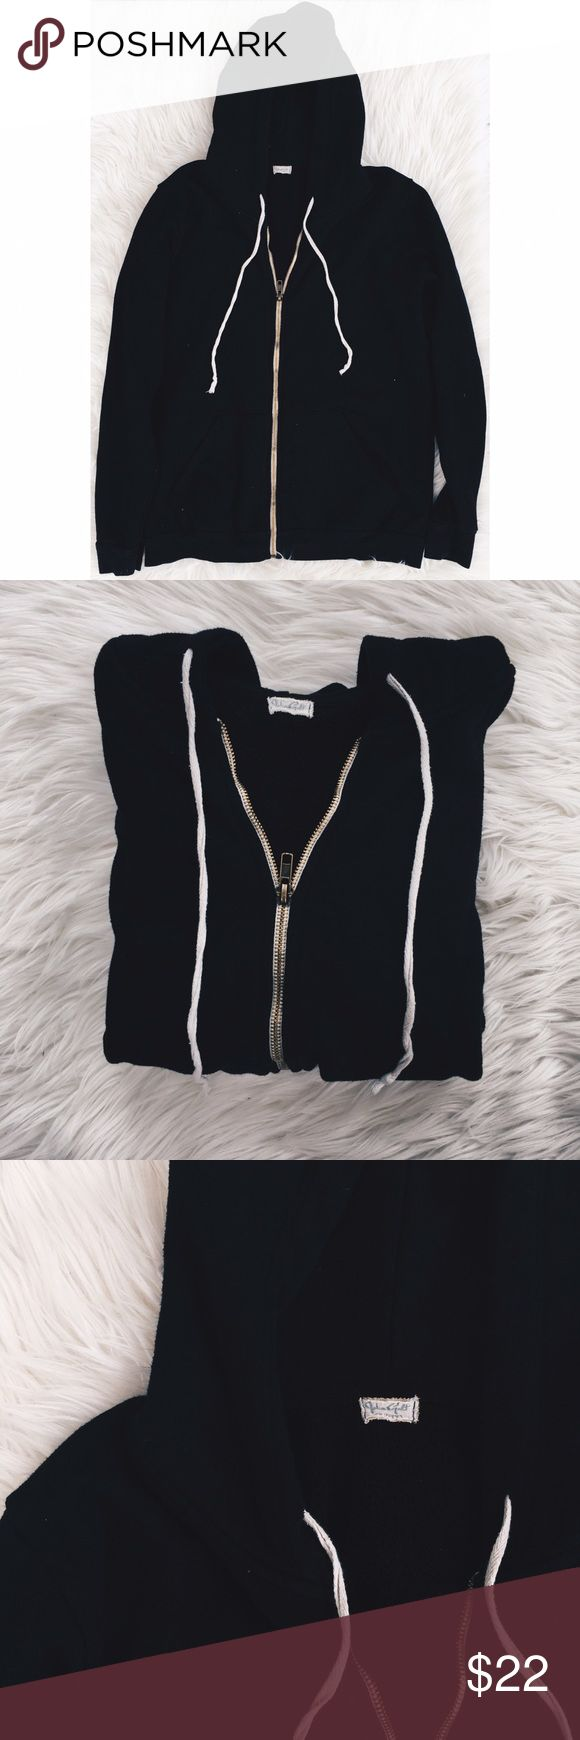 Black J. Galt Zip Up Sweater Brandy Melville Black zip up hoodie! No flaws. Very soft and warm! Brandy melville (JGALT). One size! Brandy Melville Sweaters